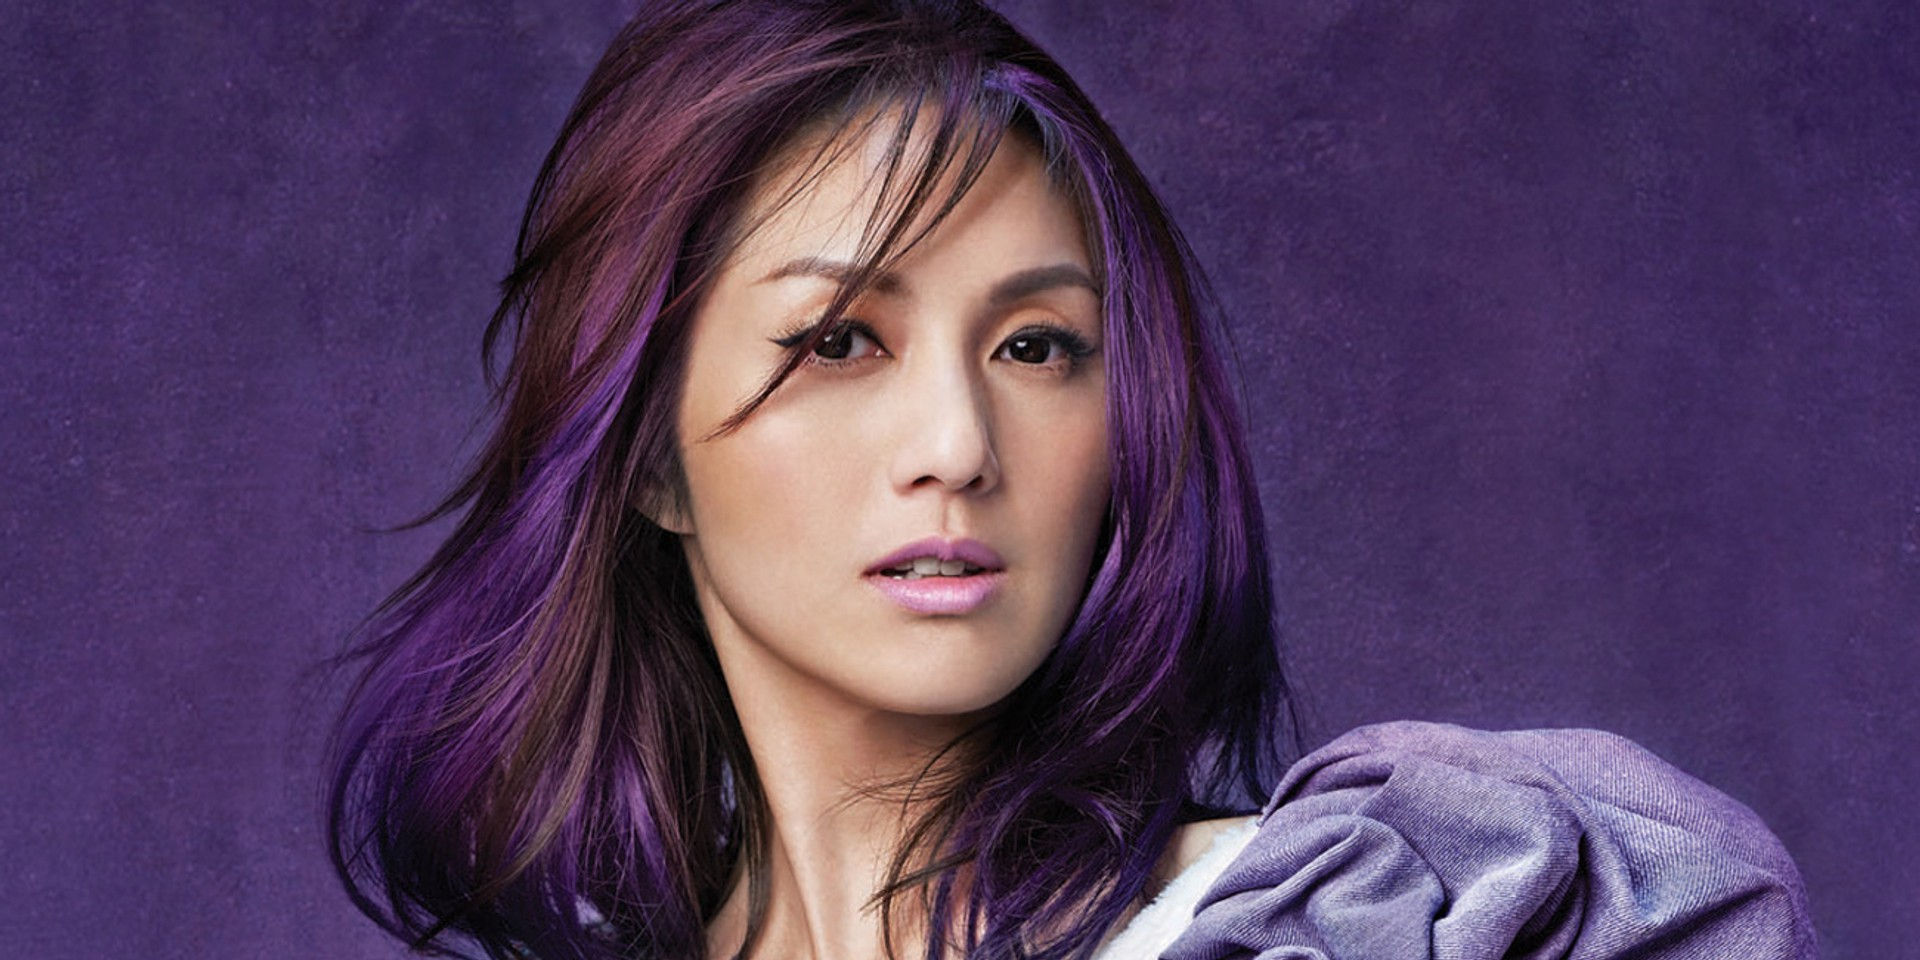 Miriam Yeung's Singapore concert postponed